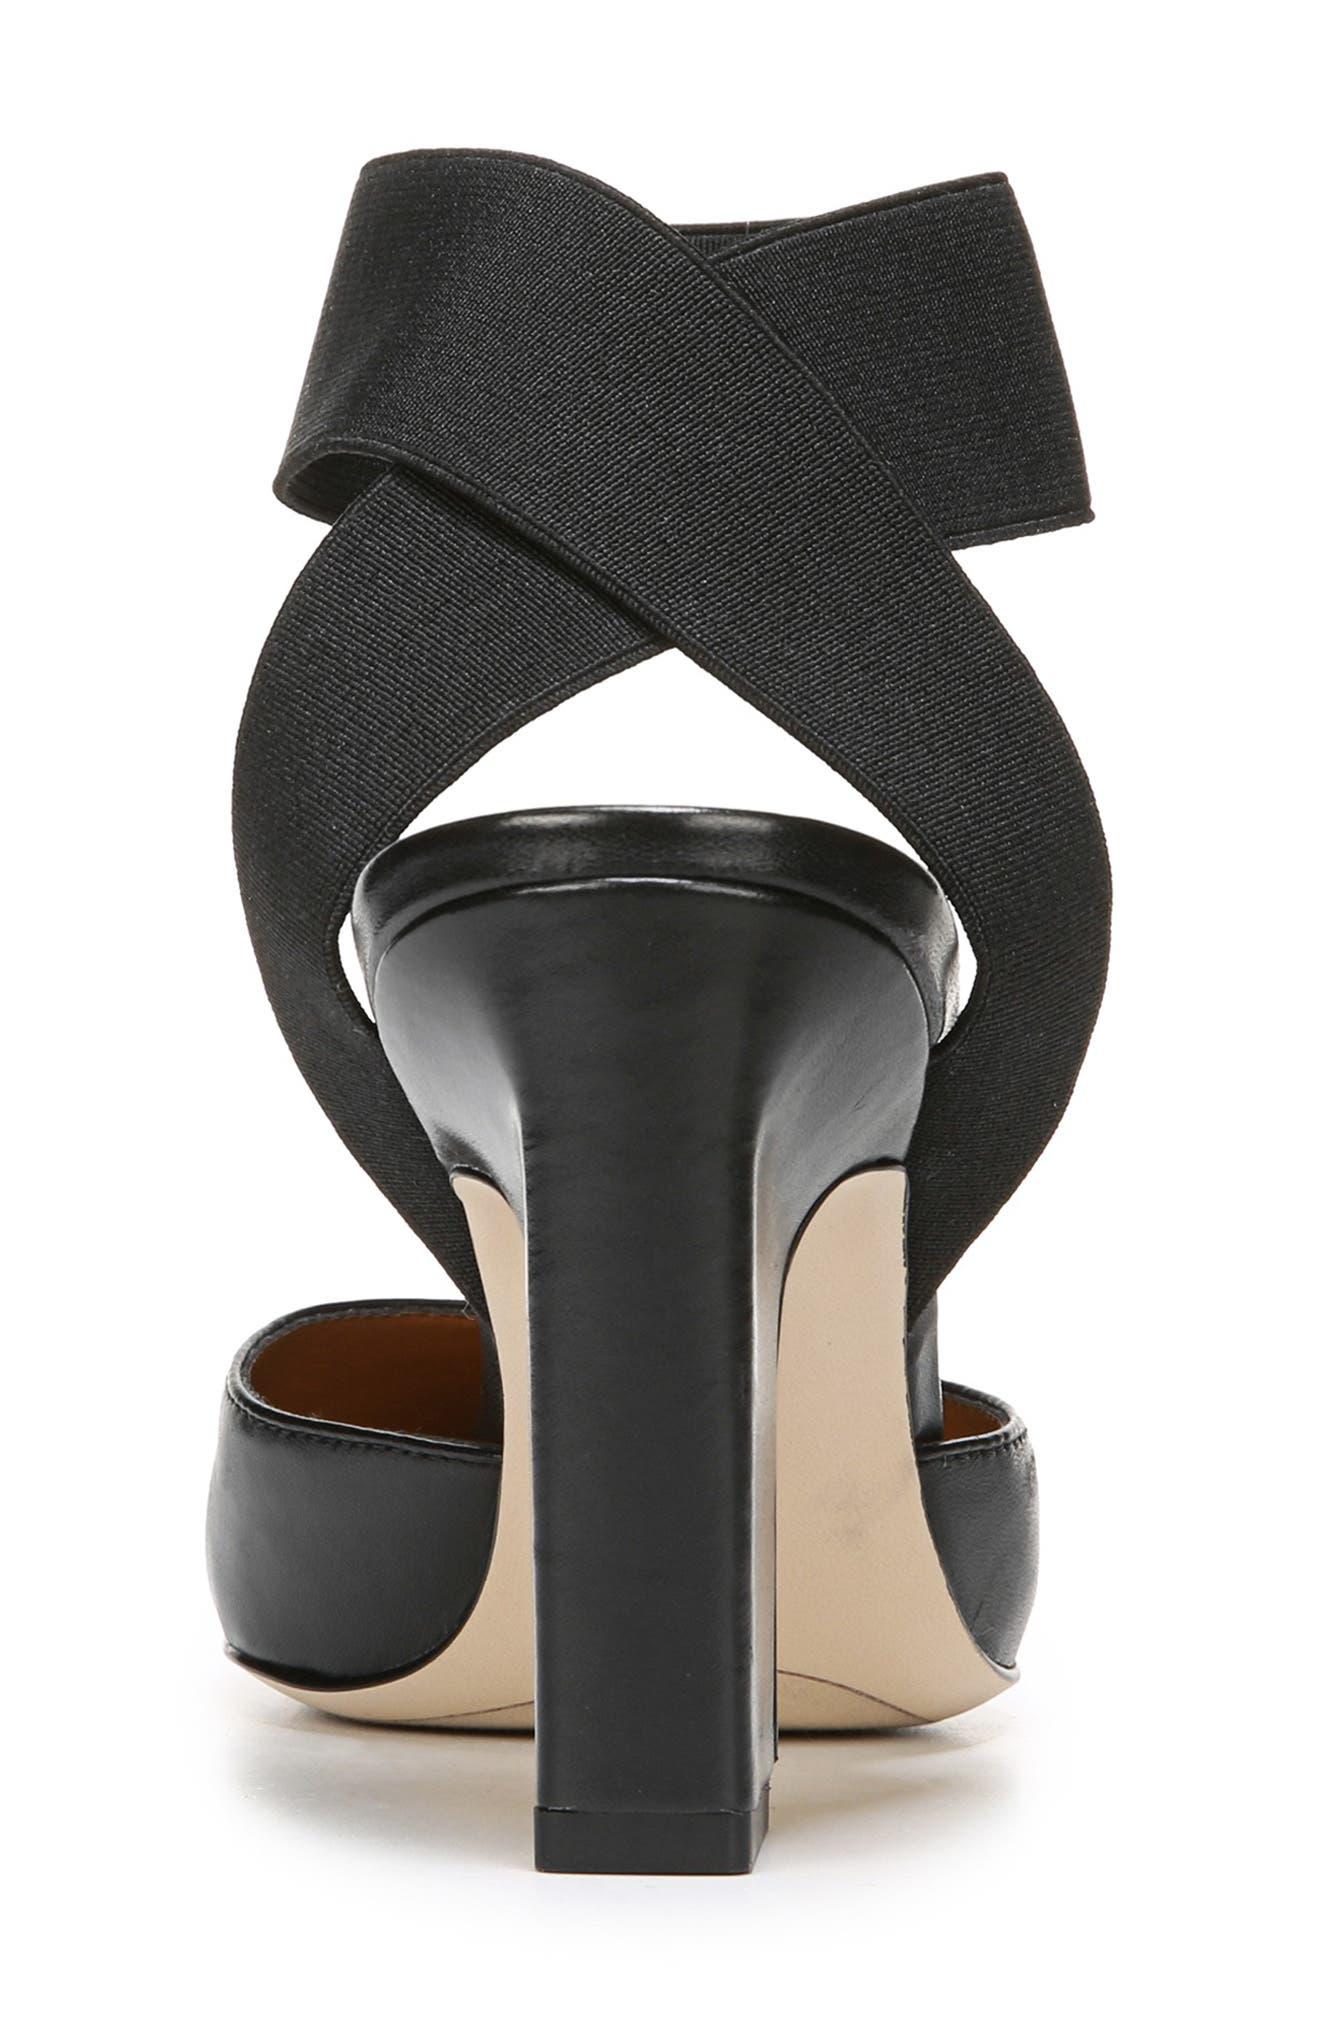 SARTO BY FRANCO SARTO, Stella Ankle Wrap Pump, Alternate thumbnail 7, color, BLACK LEATHER